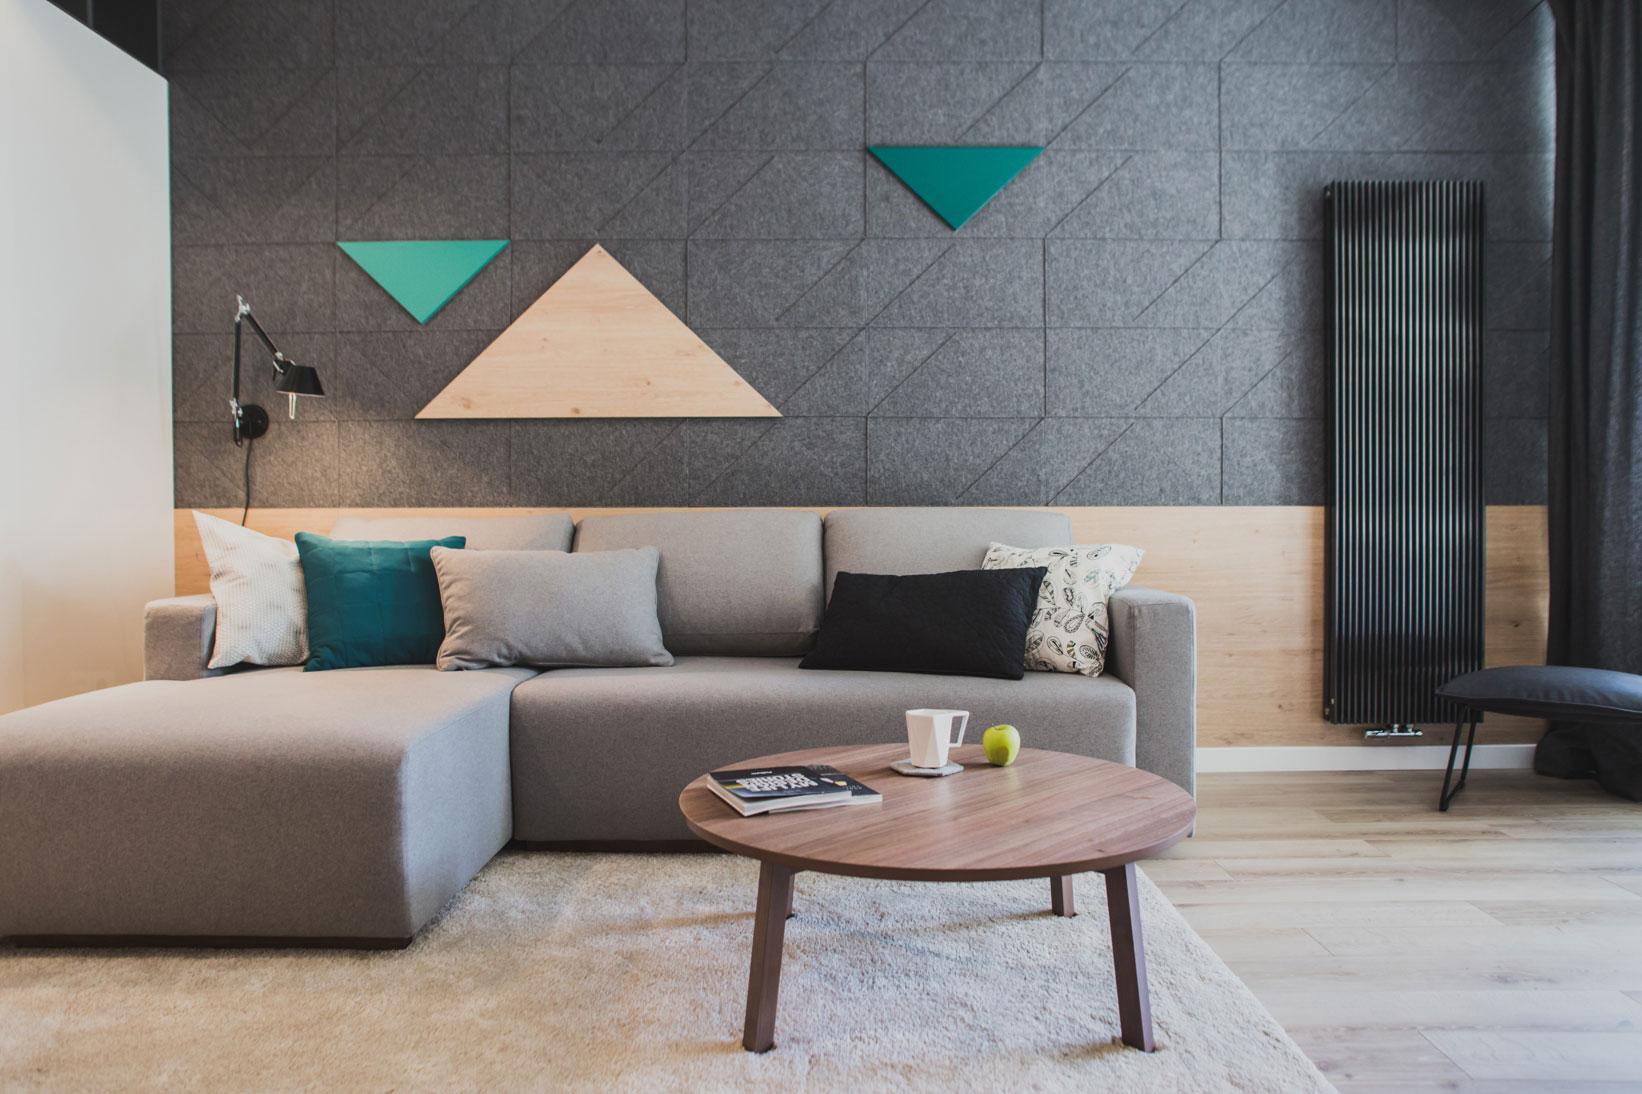 Szafarnia 2 Compact Apartment by Raca Architekci-06